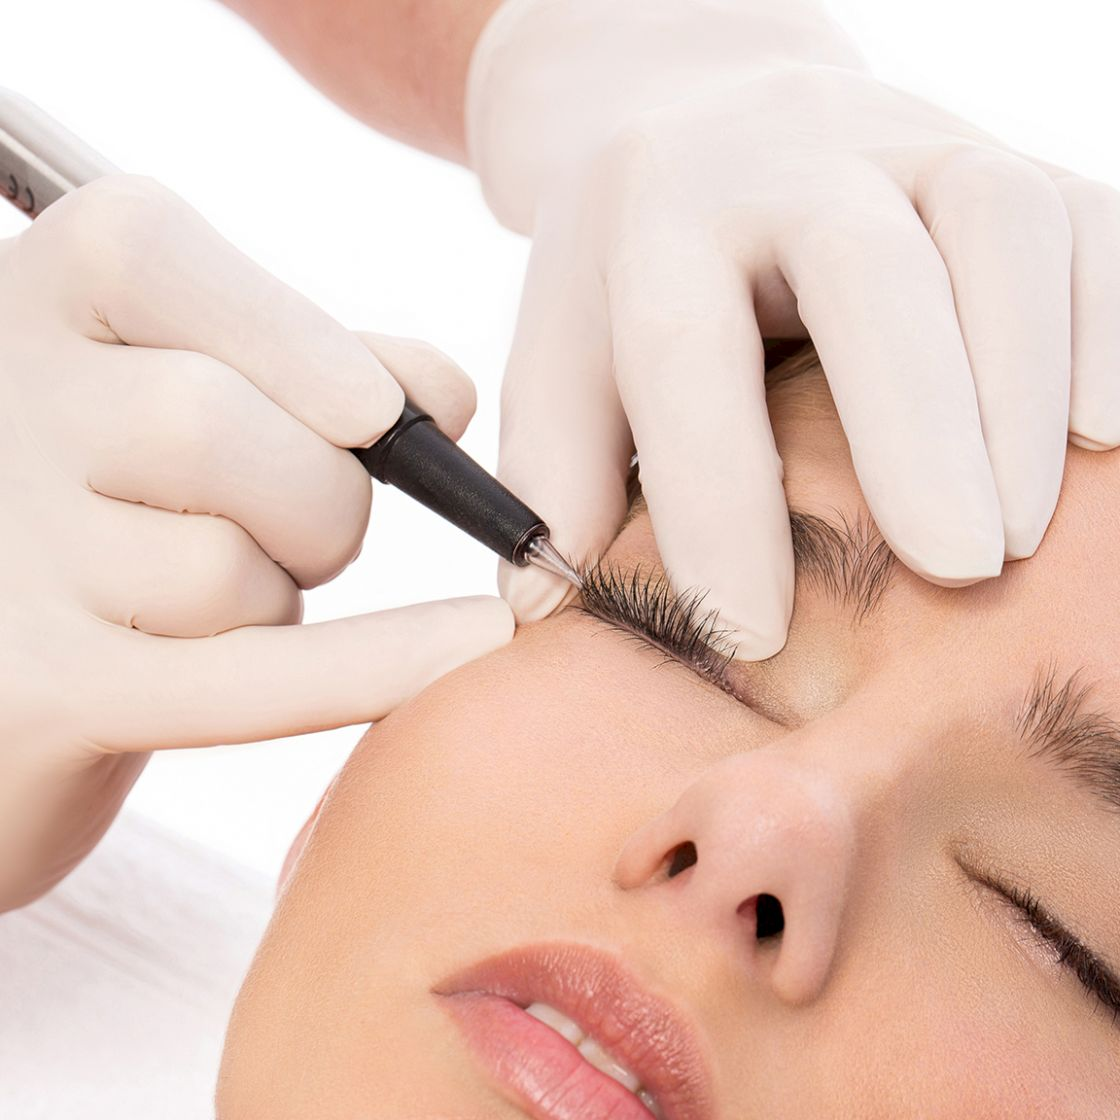 Permanent Makeup And Semi